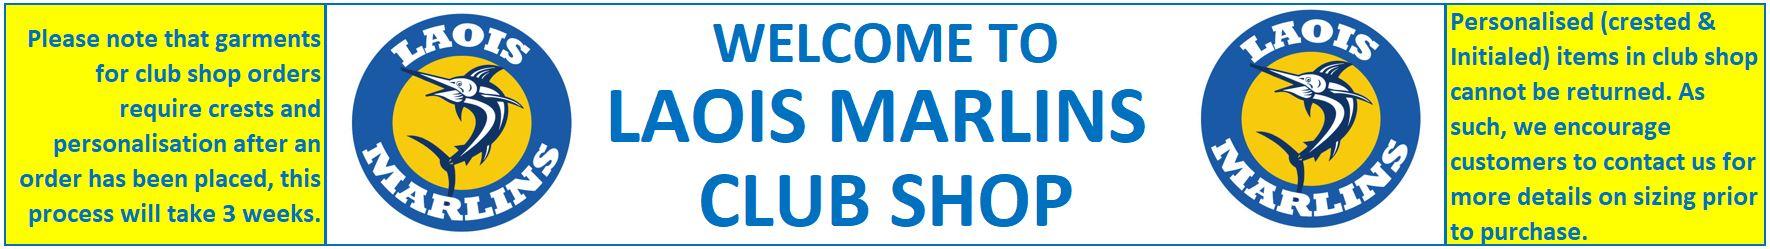 Laois Marlins